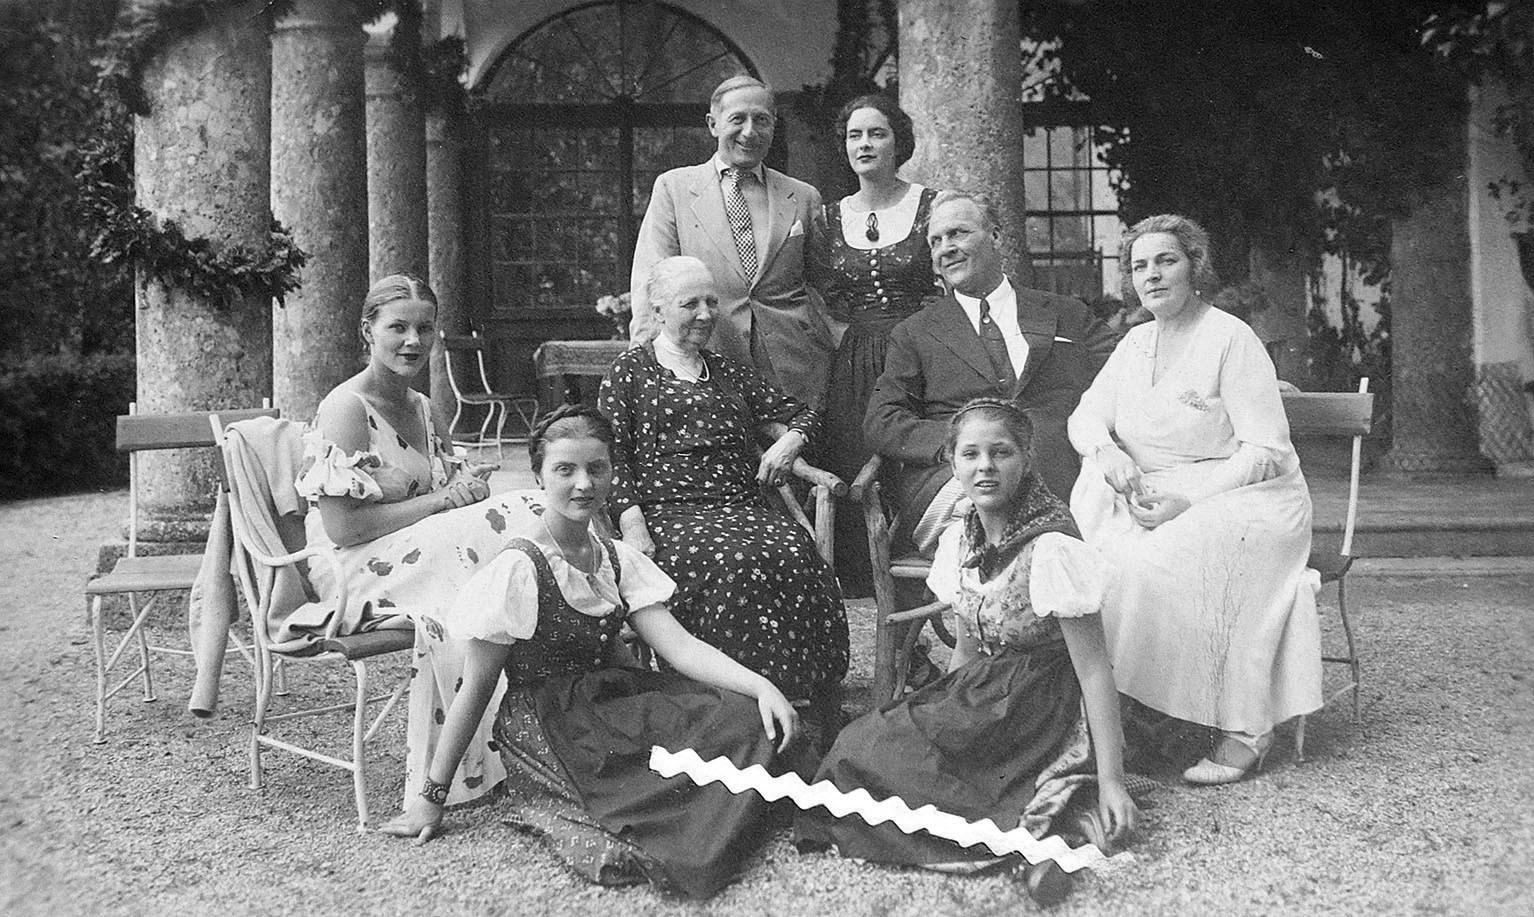 Šaljapinova družina. Tirolska. Kitzbuehel. 1934